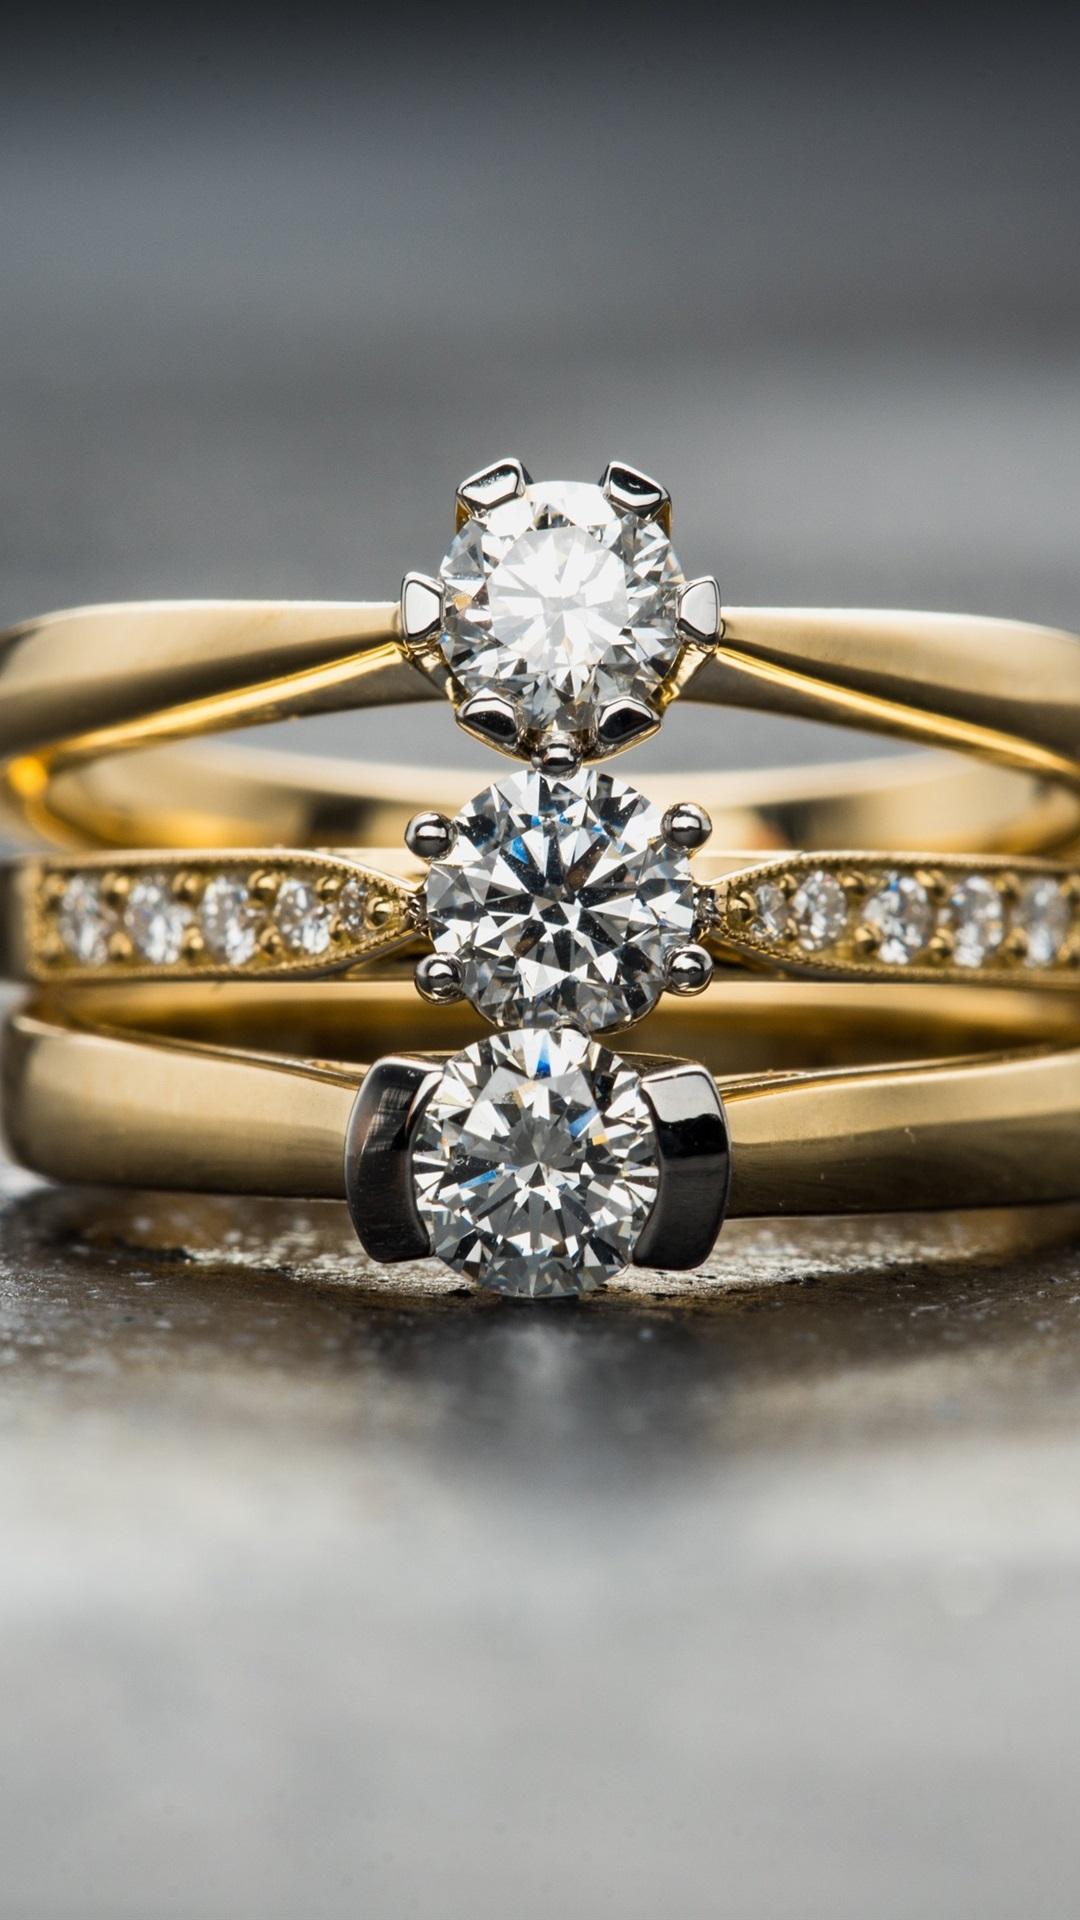 Diamonds Rings Gold 1080x1920 Iphone 8 7 6 6s Plus Wallpaper